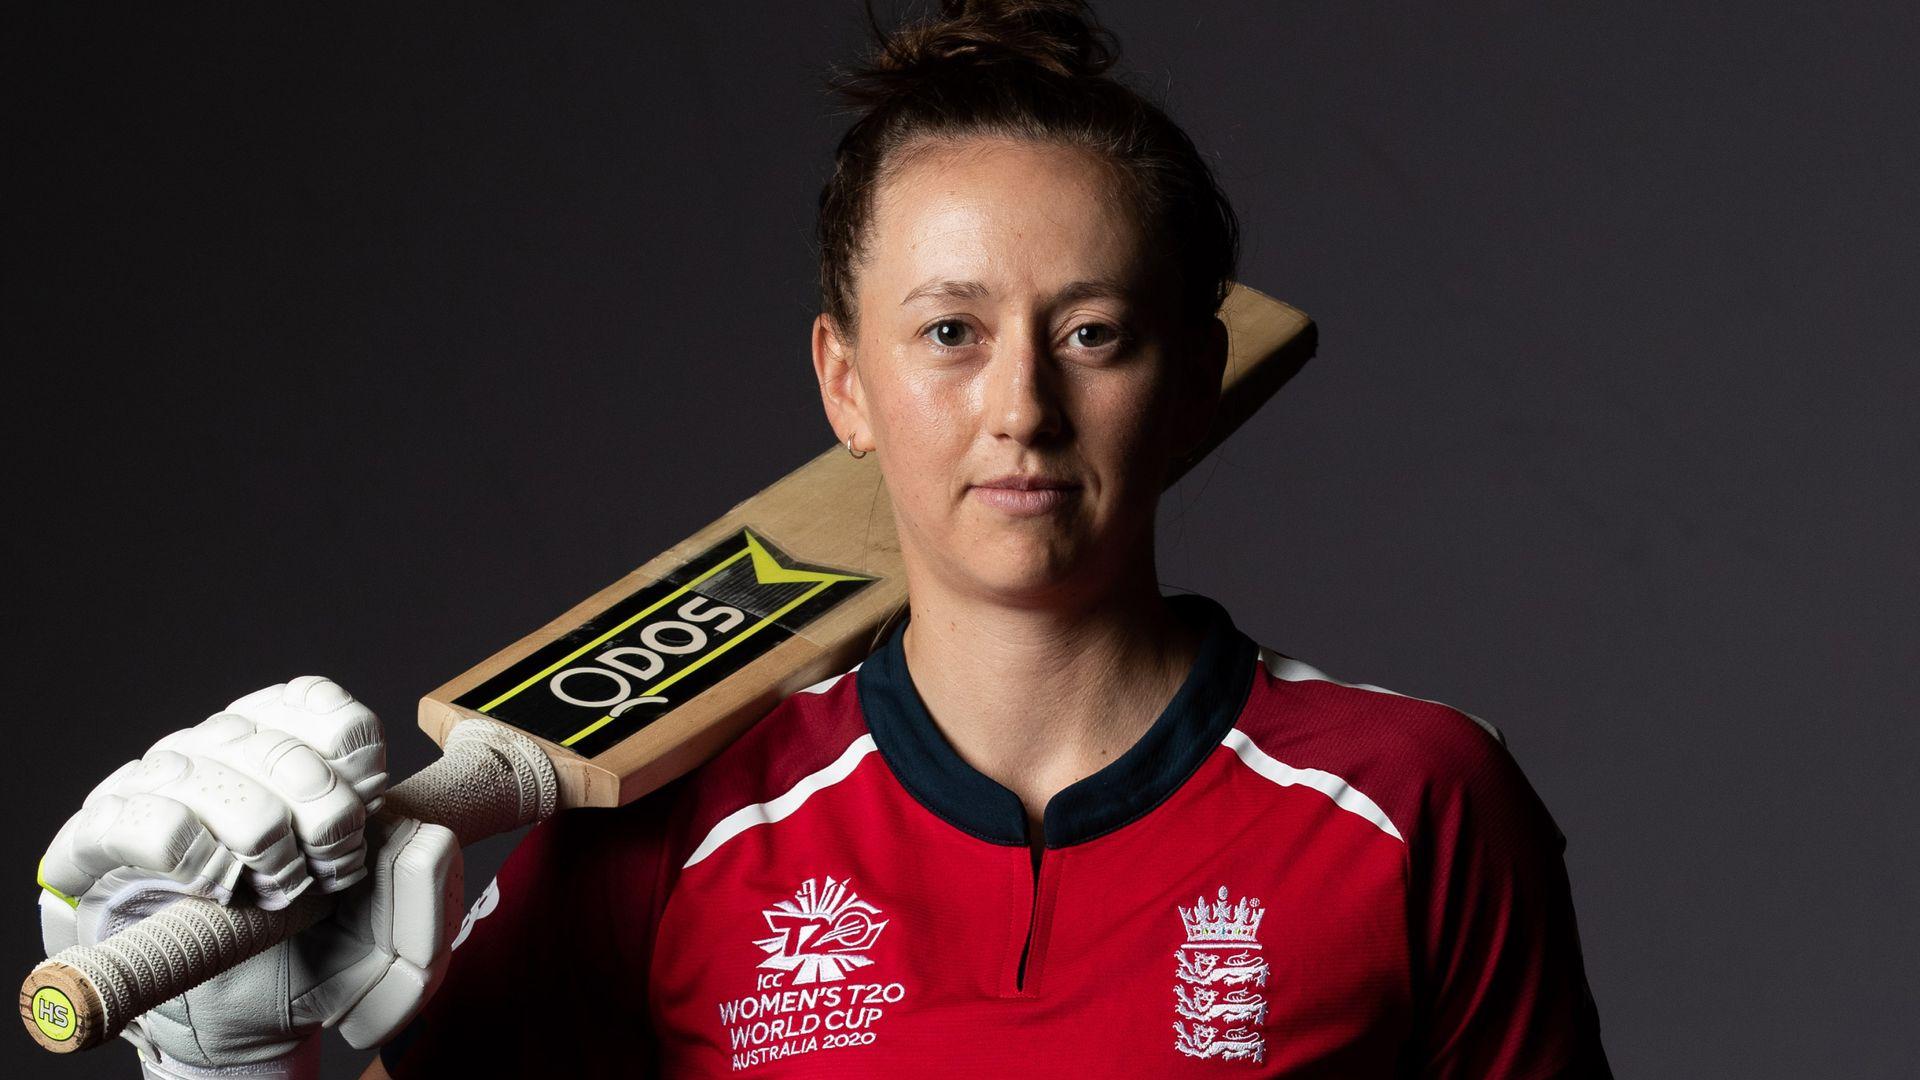 World Cup winner Wilson retires from international cricket